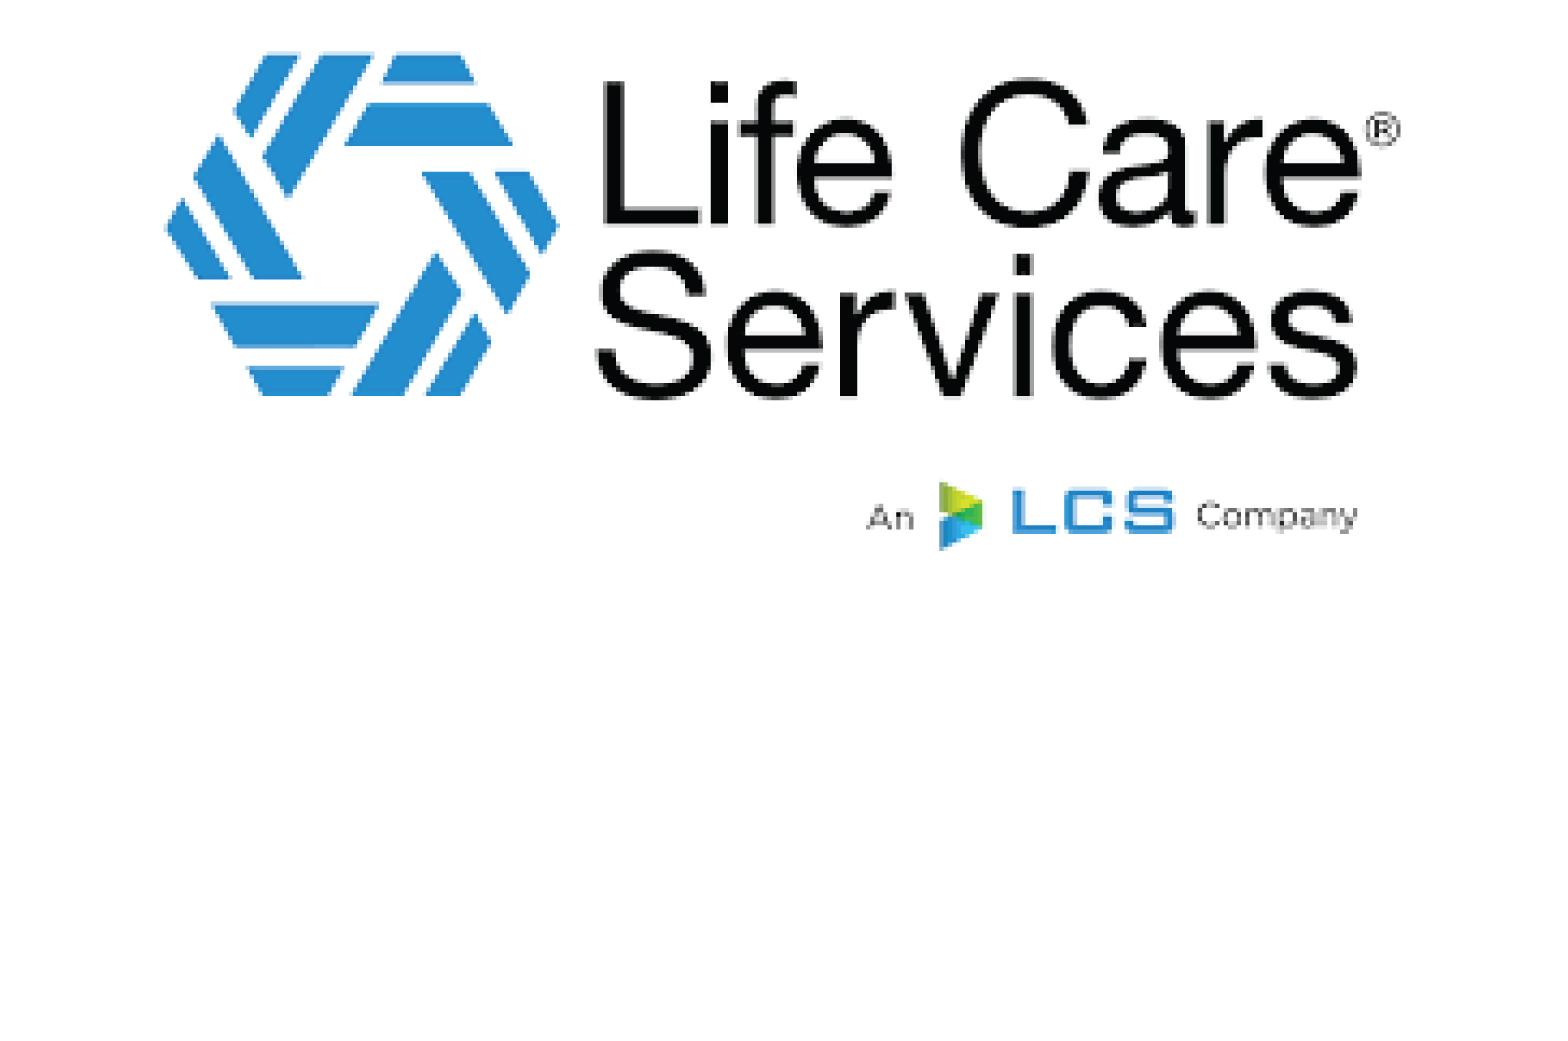 Life Care Services logo